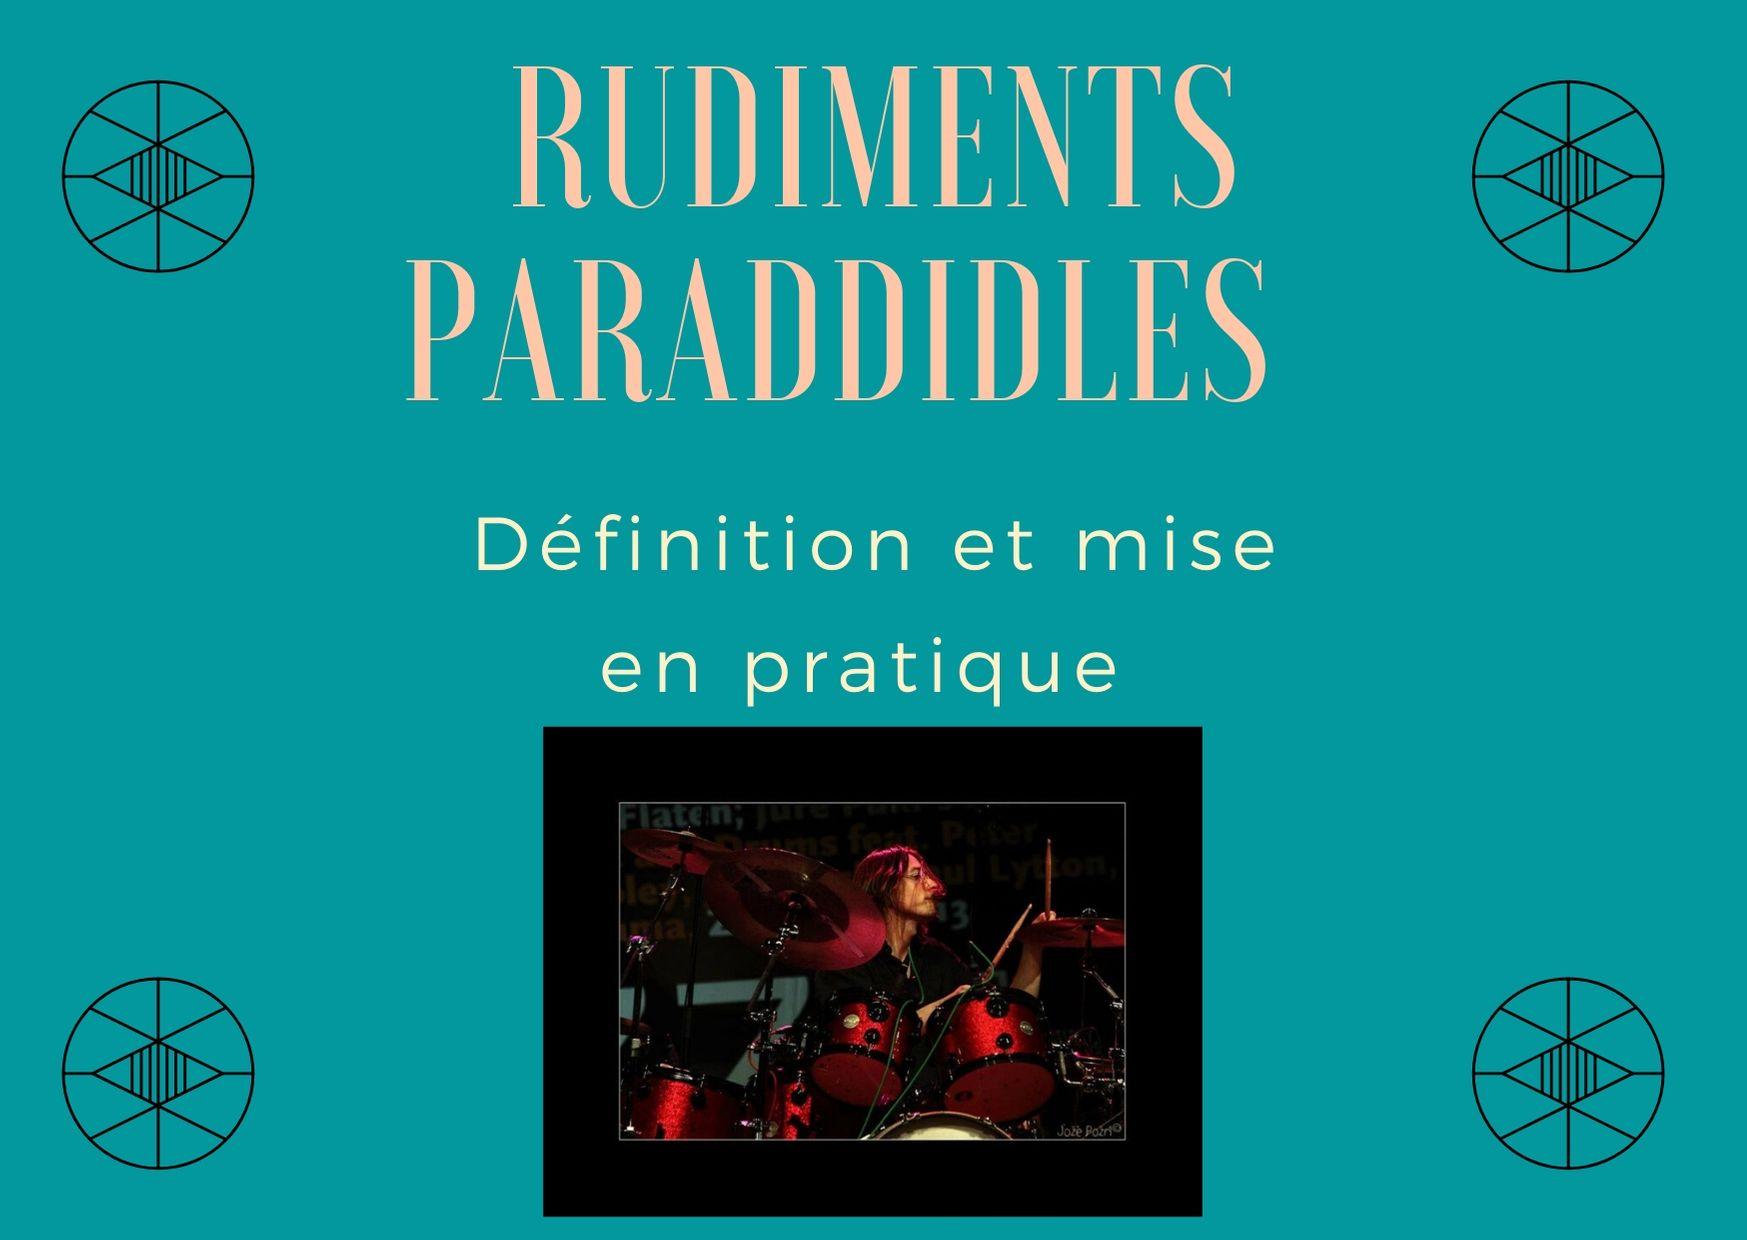 rudiments definition